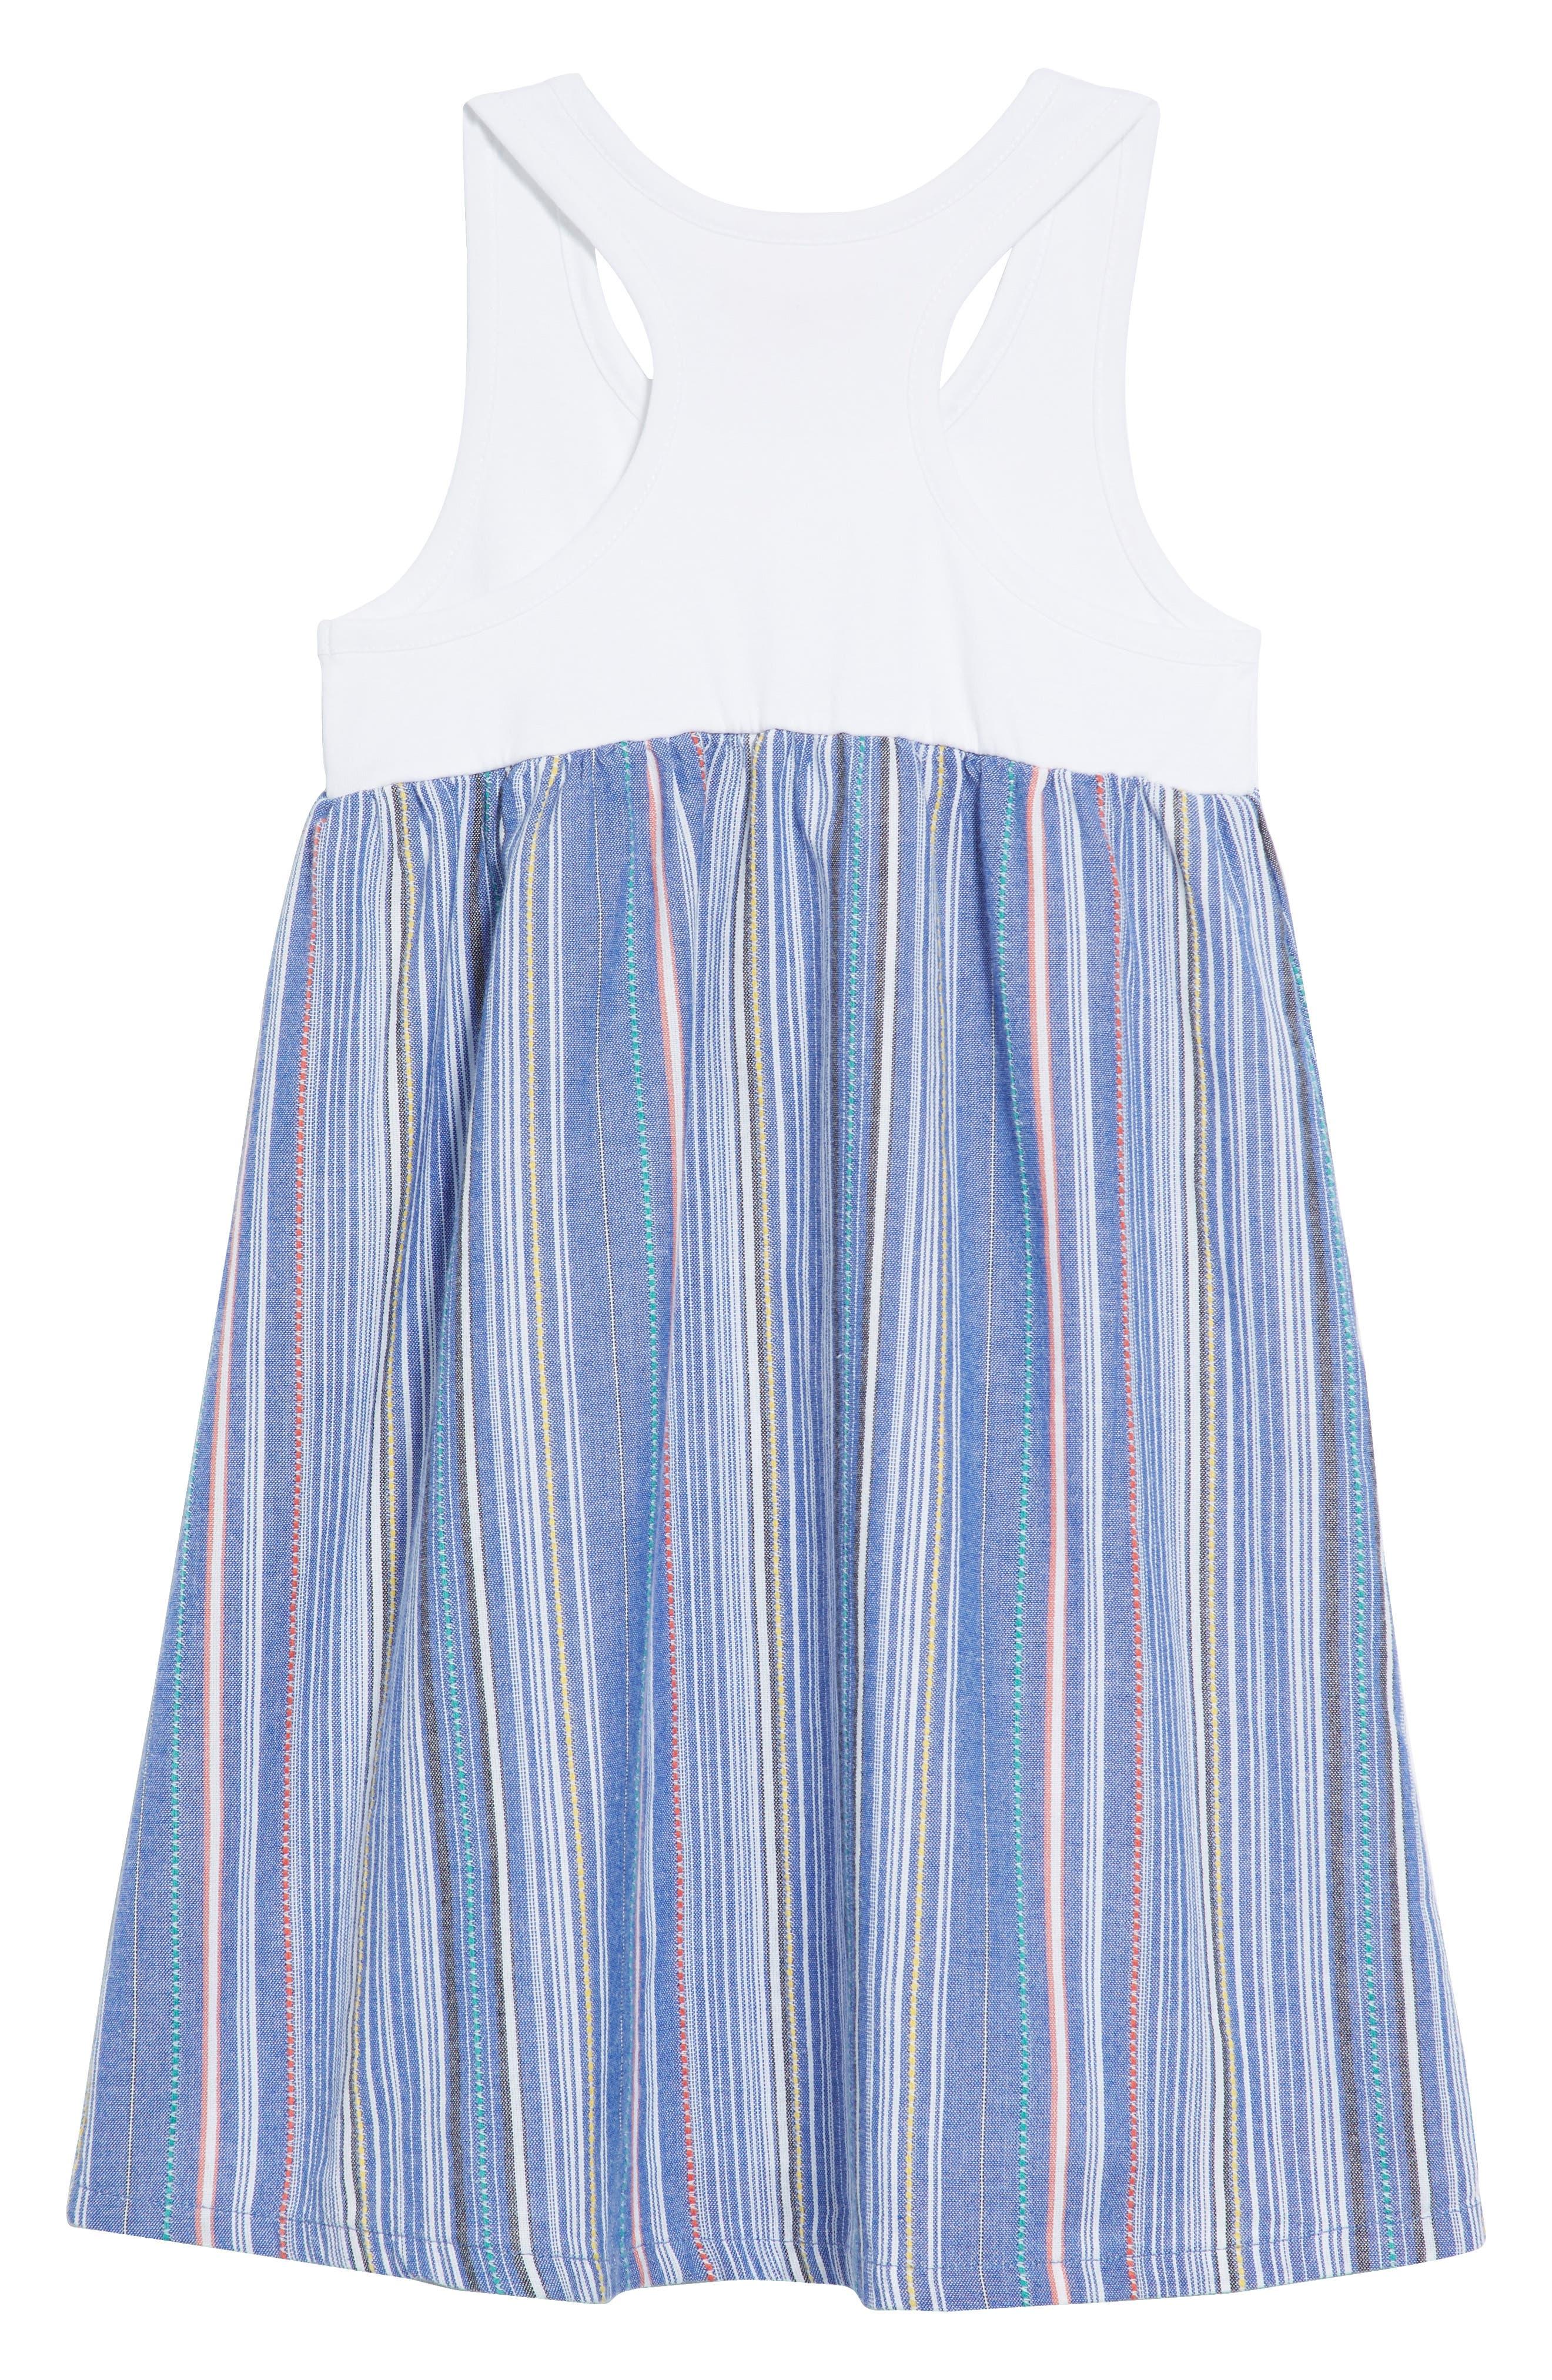 Racerback Tank Dress,                             Alternate thumbnail 2, color,                             Blue Thread Multi Stripe